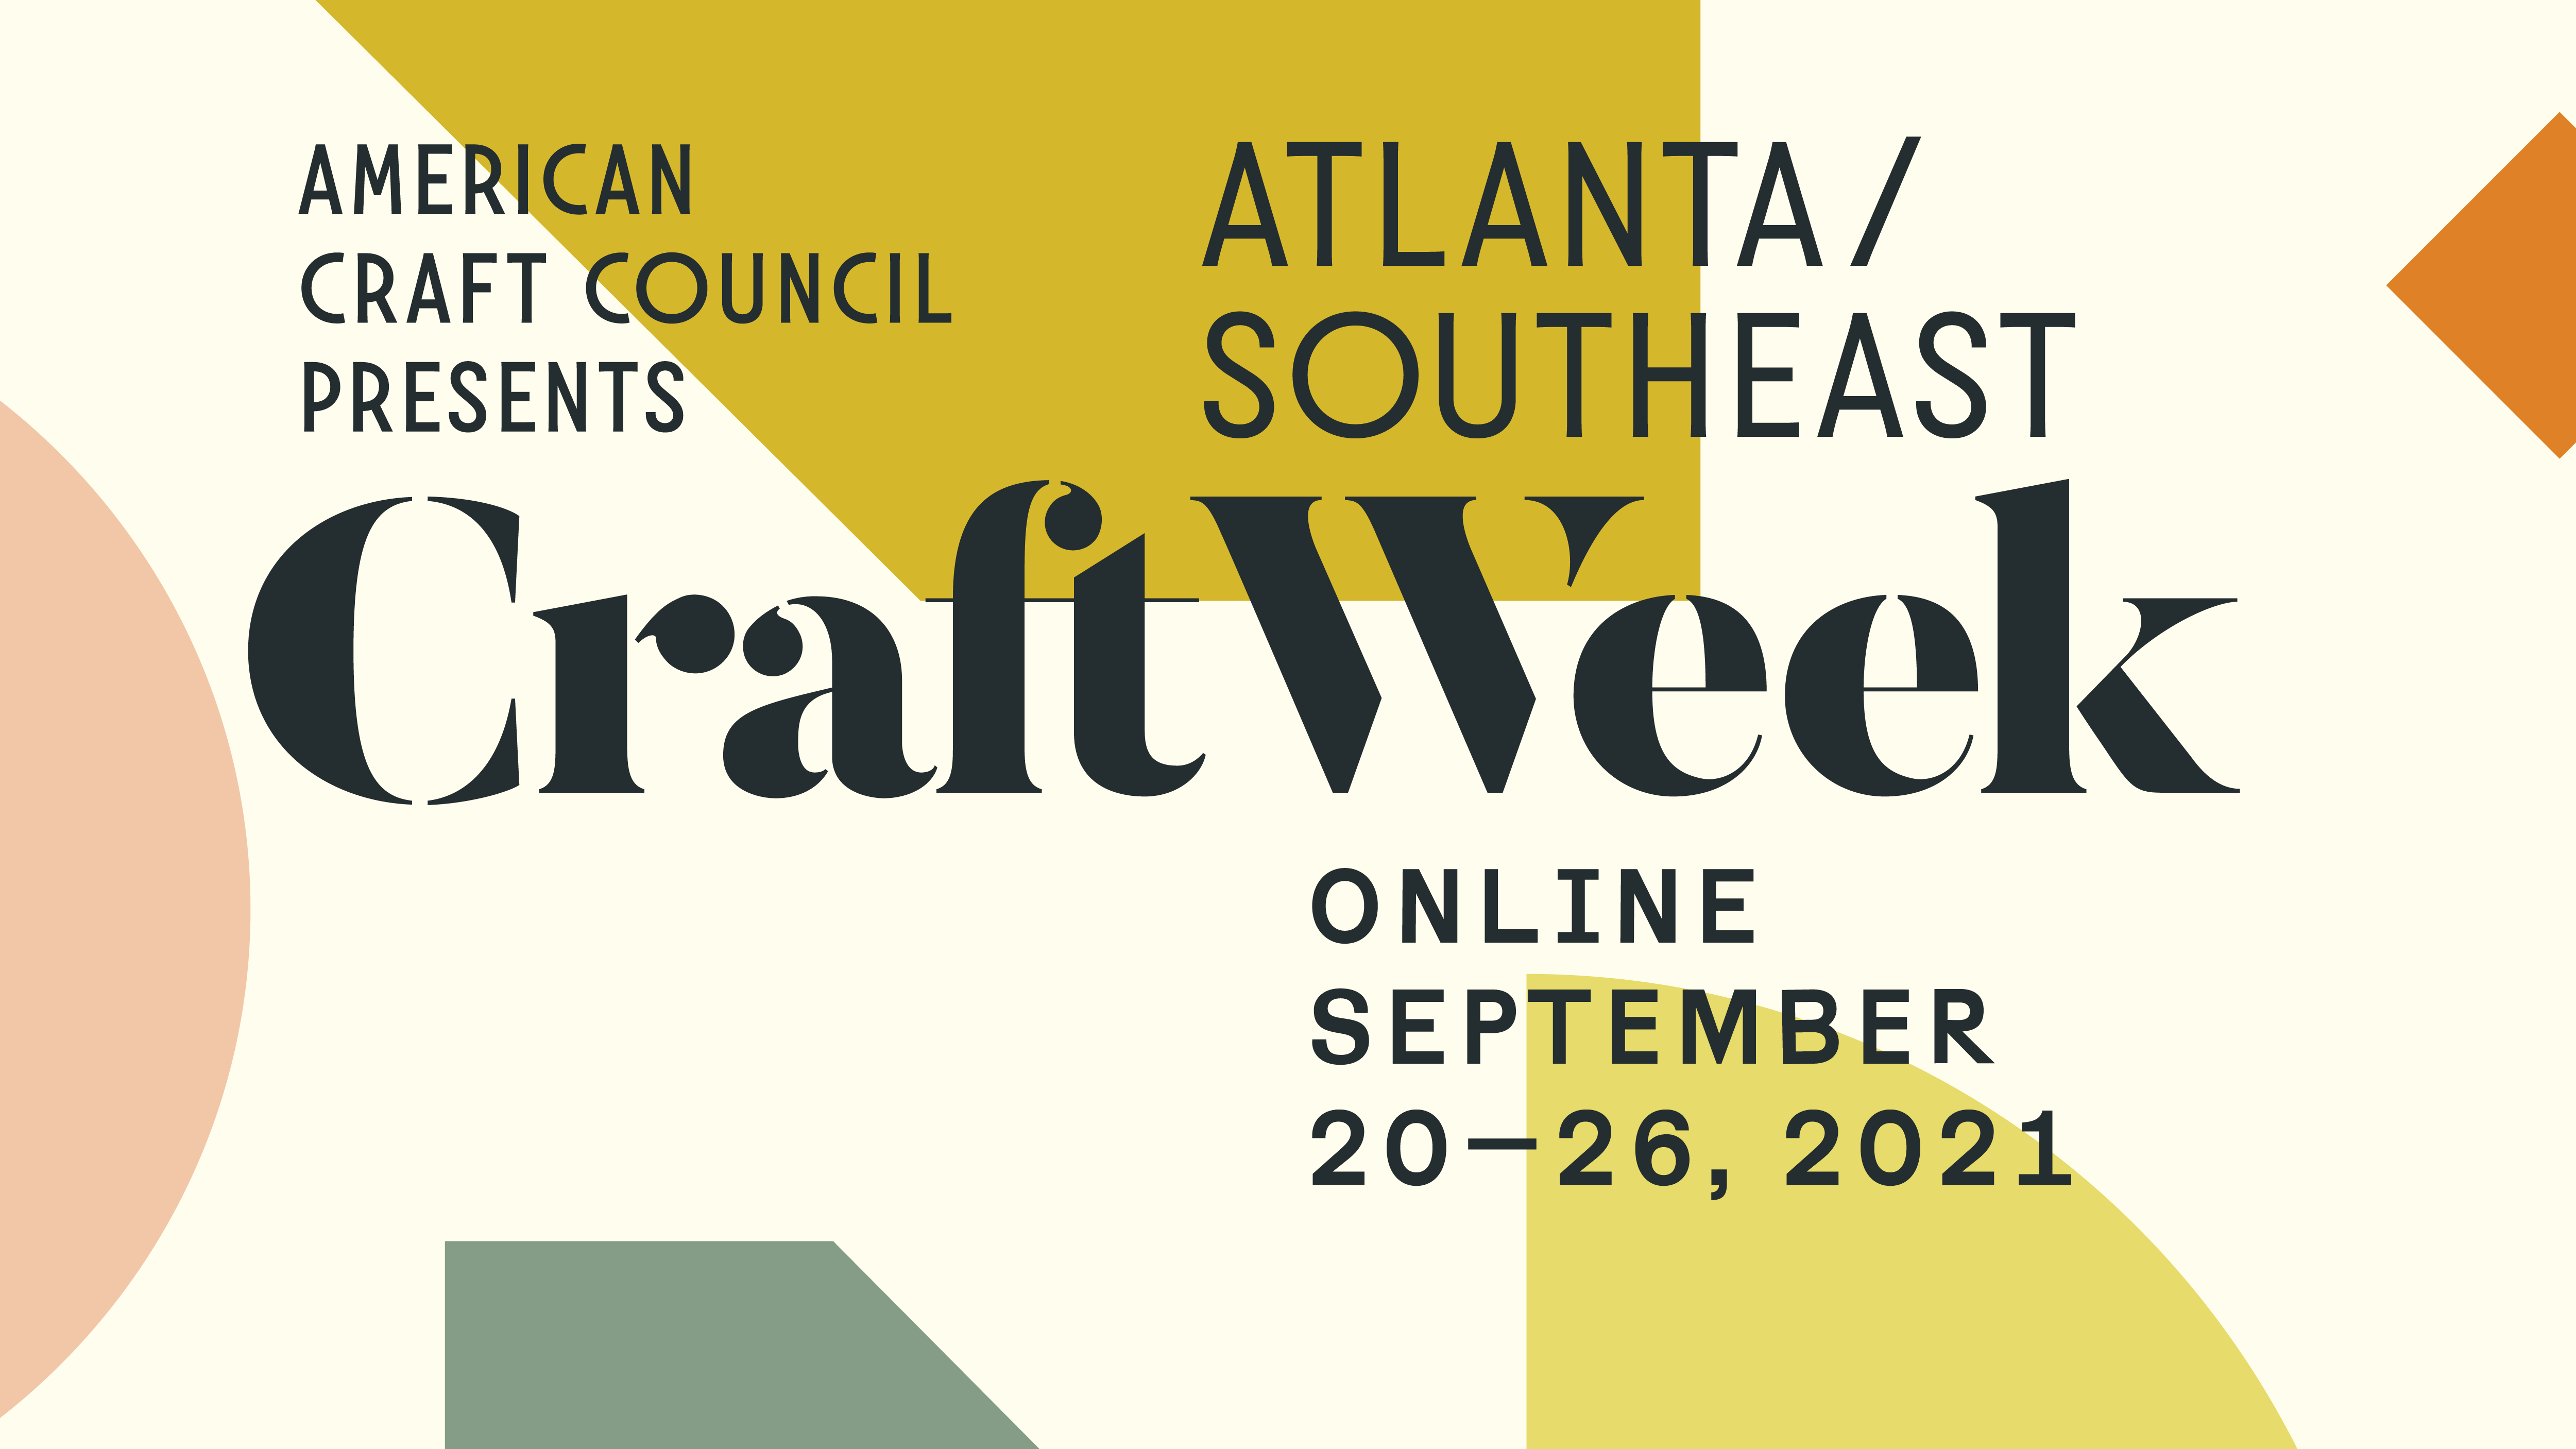 american craft council presents atlanta southeast craft week september 20–26 2021